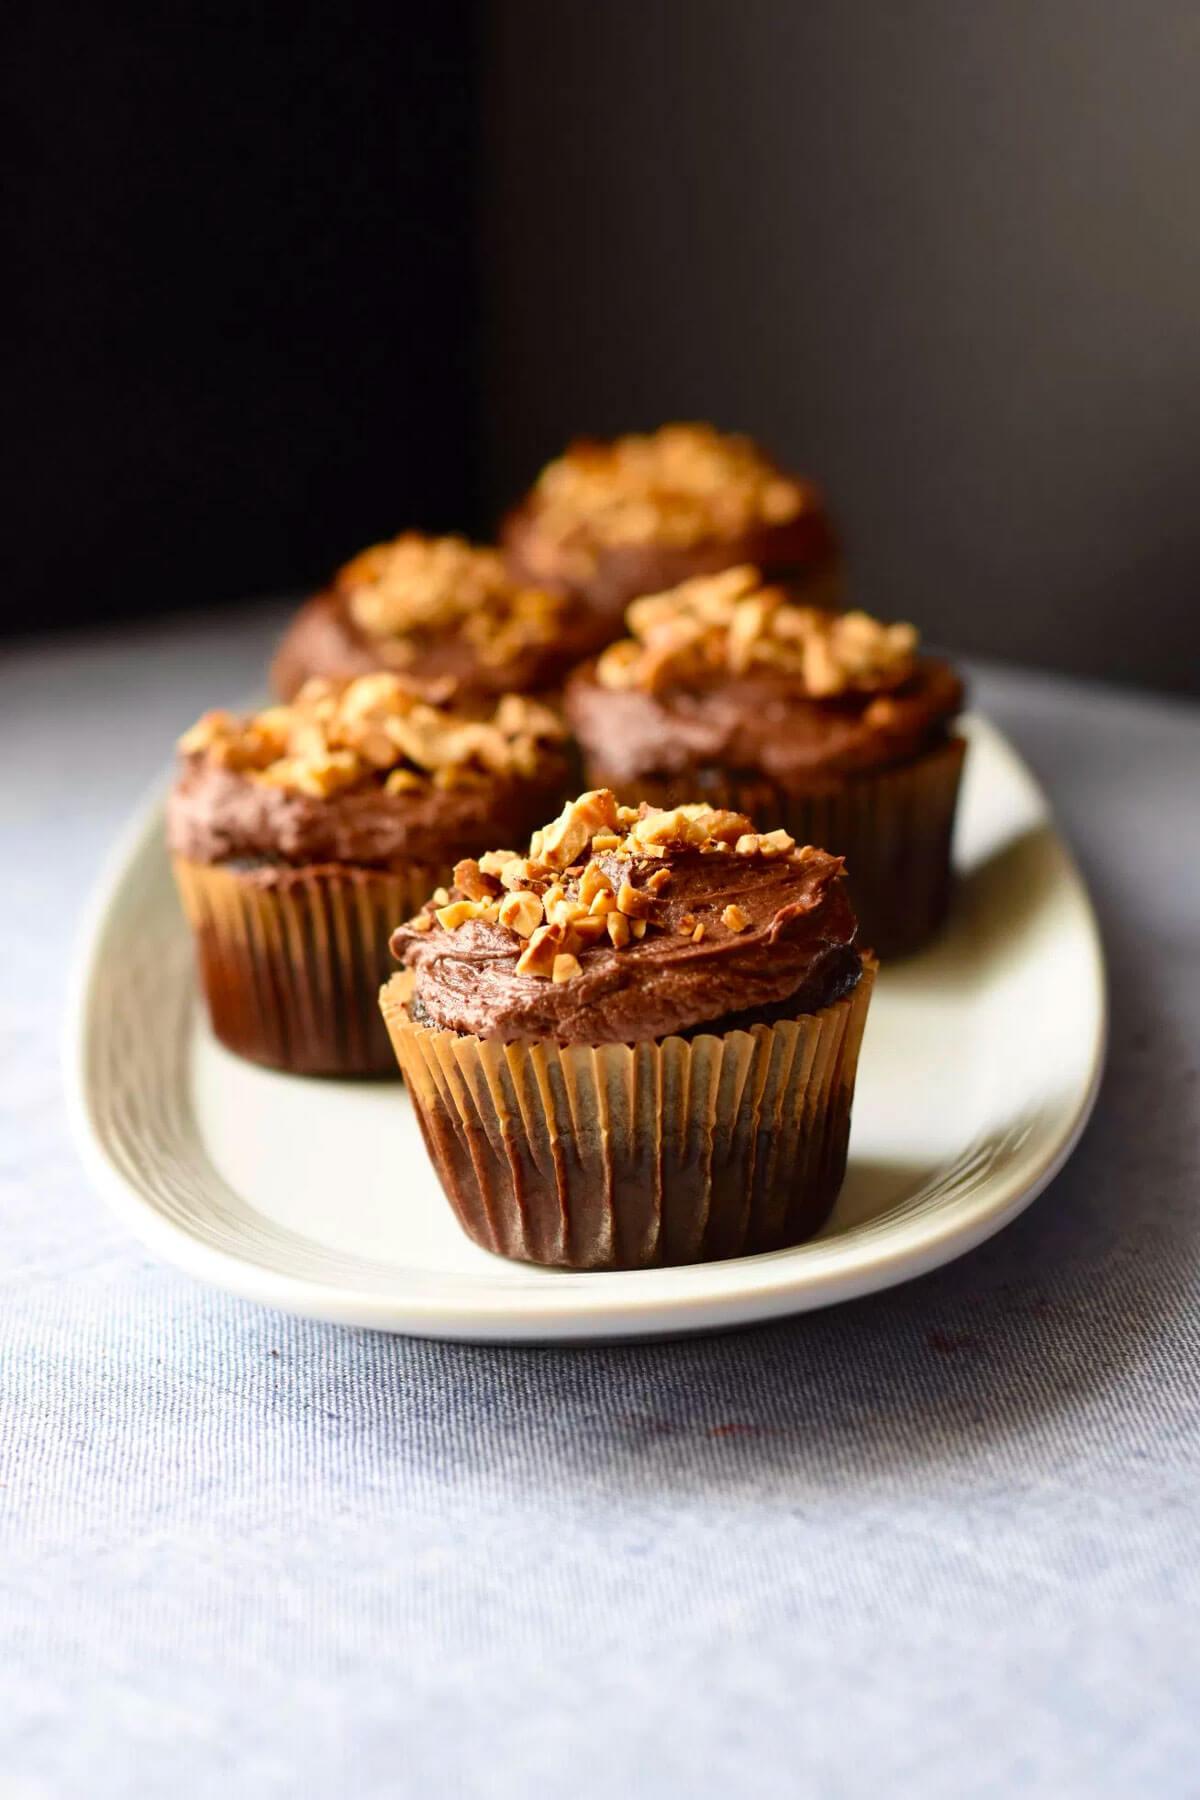 Chocolate Hazelnut Cupcakes